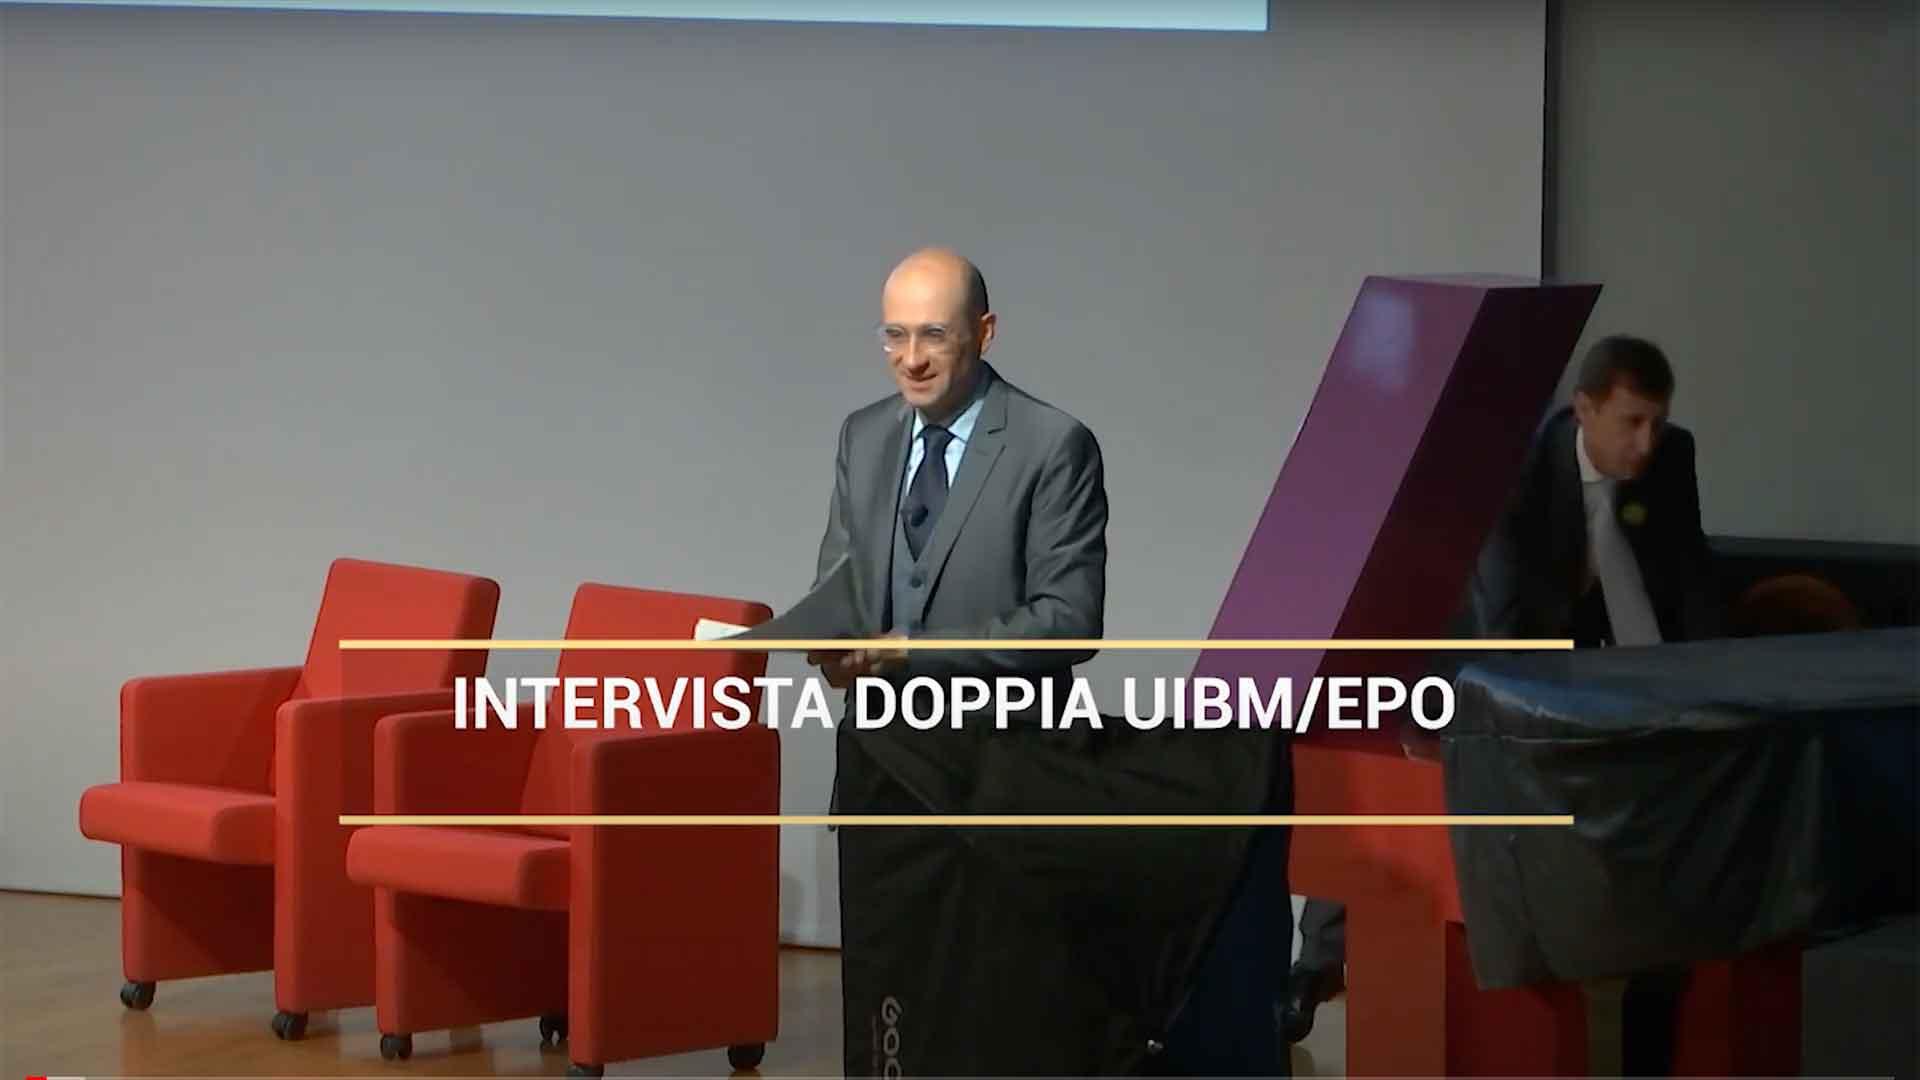 Intervista-doppia-thumbnail